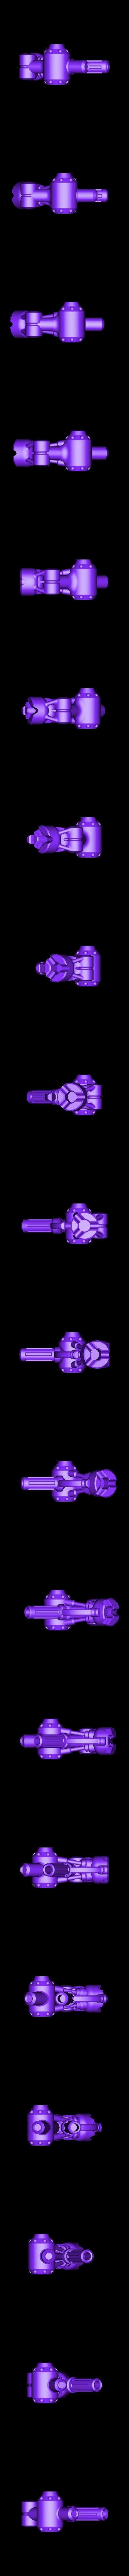 R-leg-leg.stl Download free STL file Pod Walker • 3D printing object, ferjerez3d